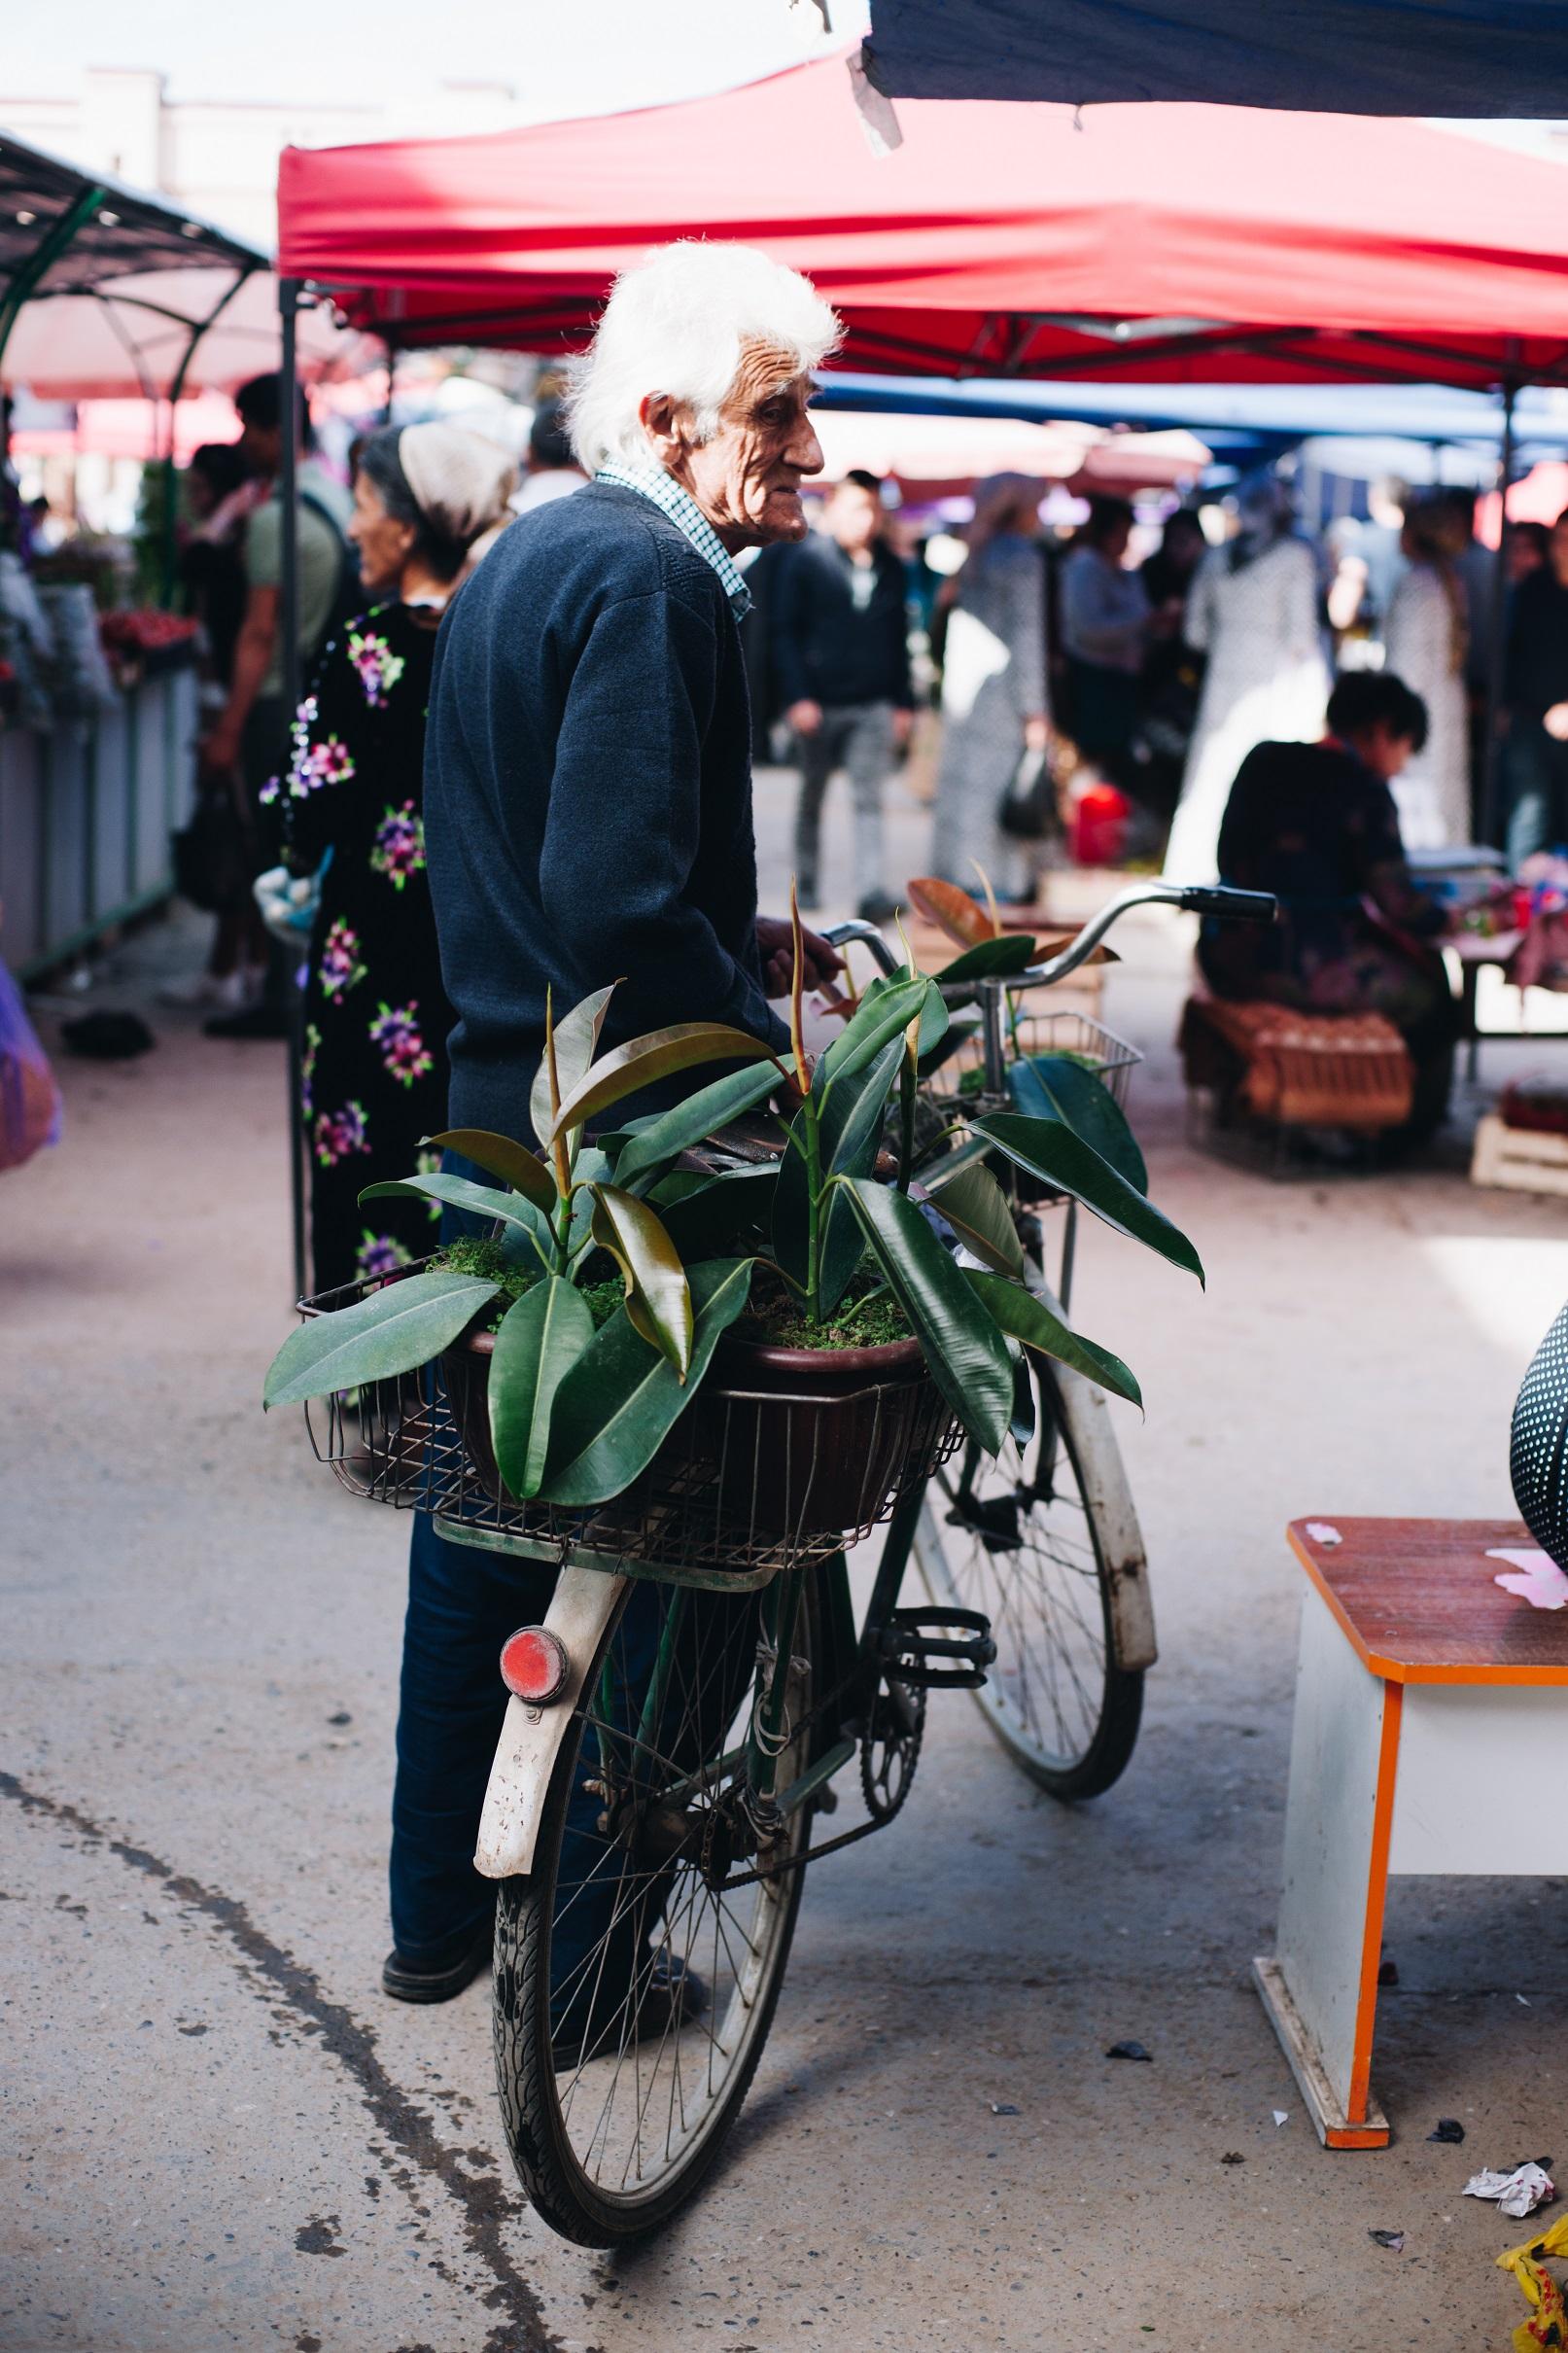 bazar siab samarkanda uzbekistan